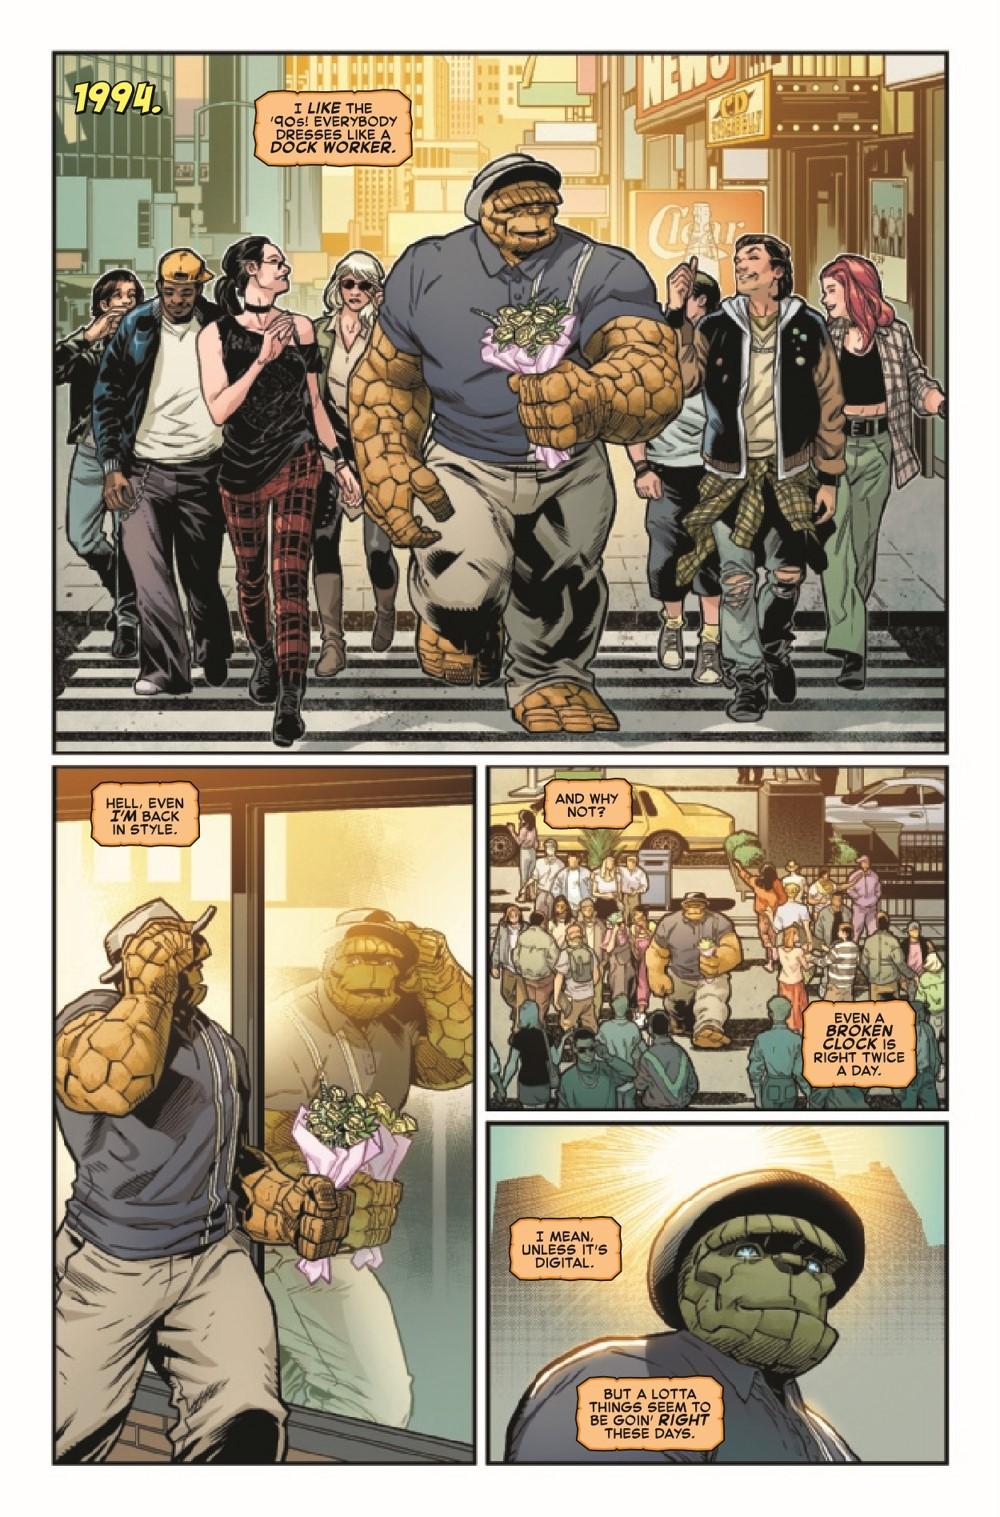 FFLIFESTORY2019004_Preview-3 ComicList Previews: FANTASTIC FOUR LIFE STORY #4 (OF 6)